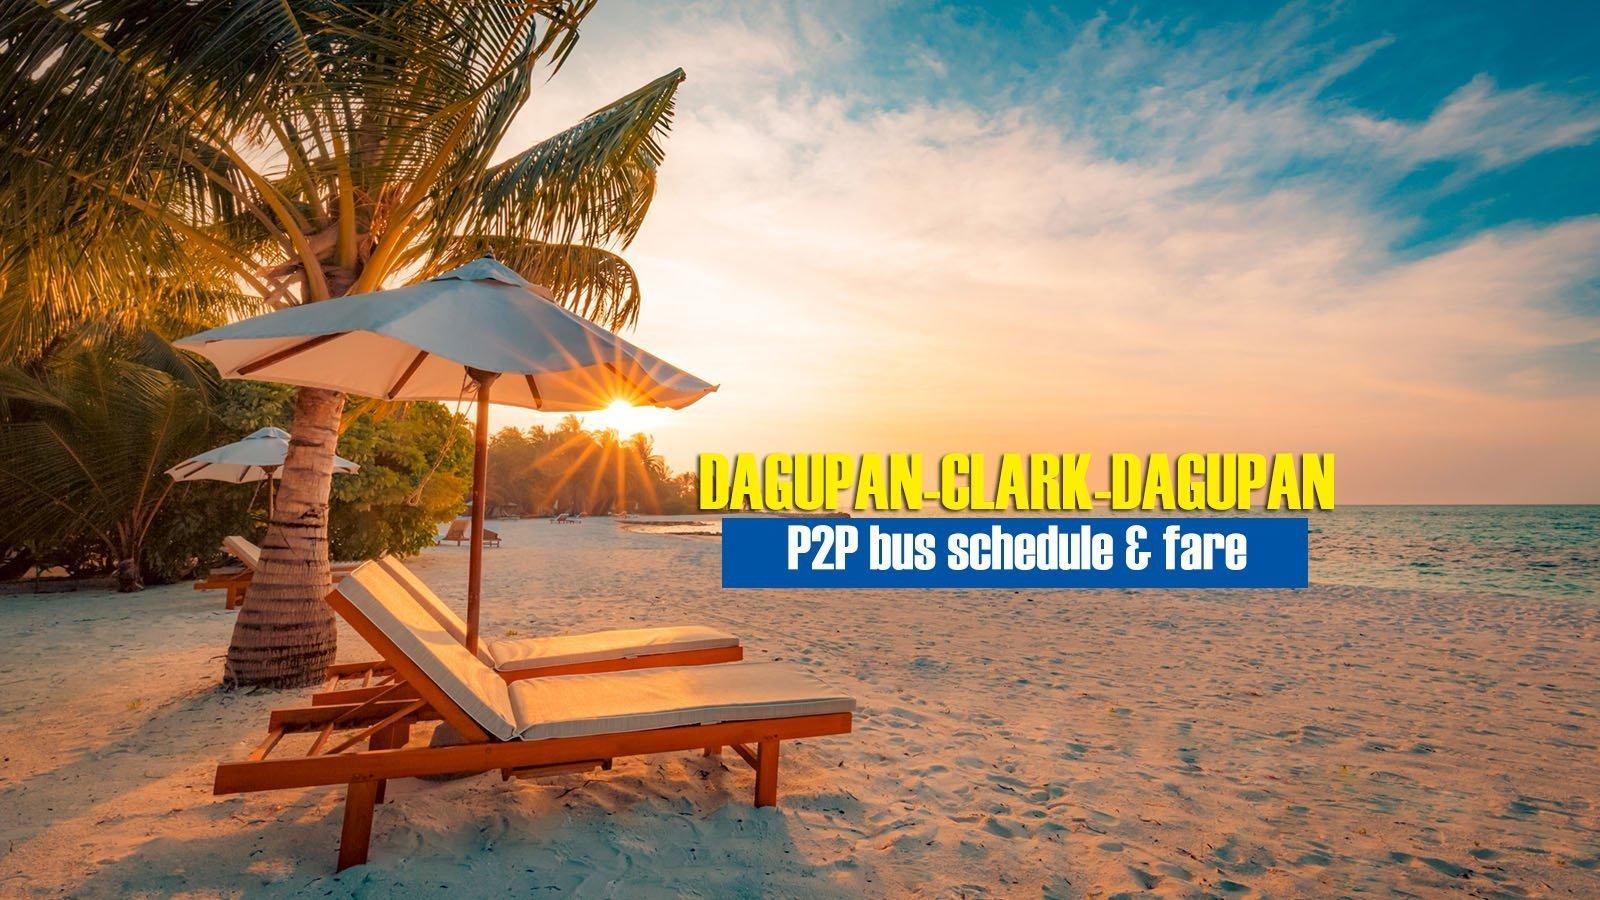 Dagupan to Clark Airport: 2020 P2P Bus Schedule